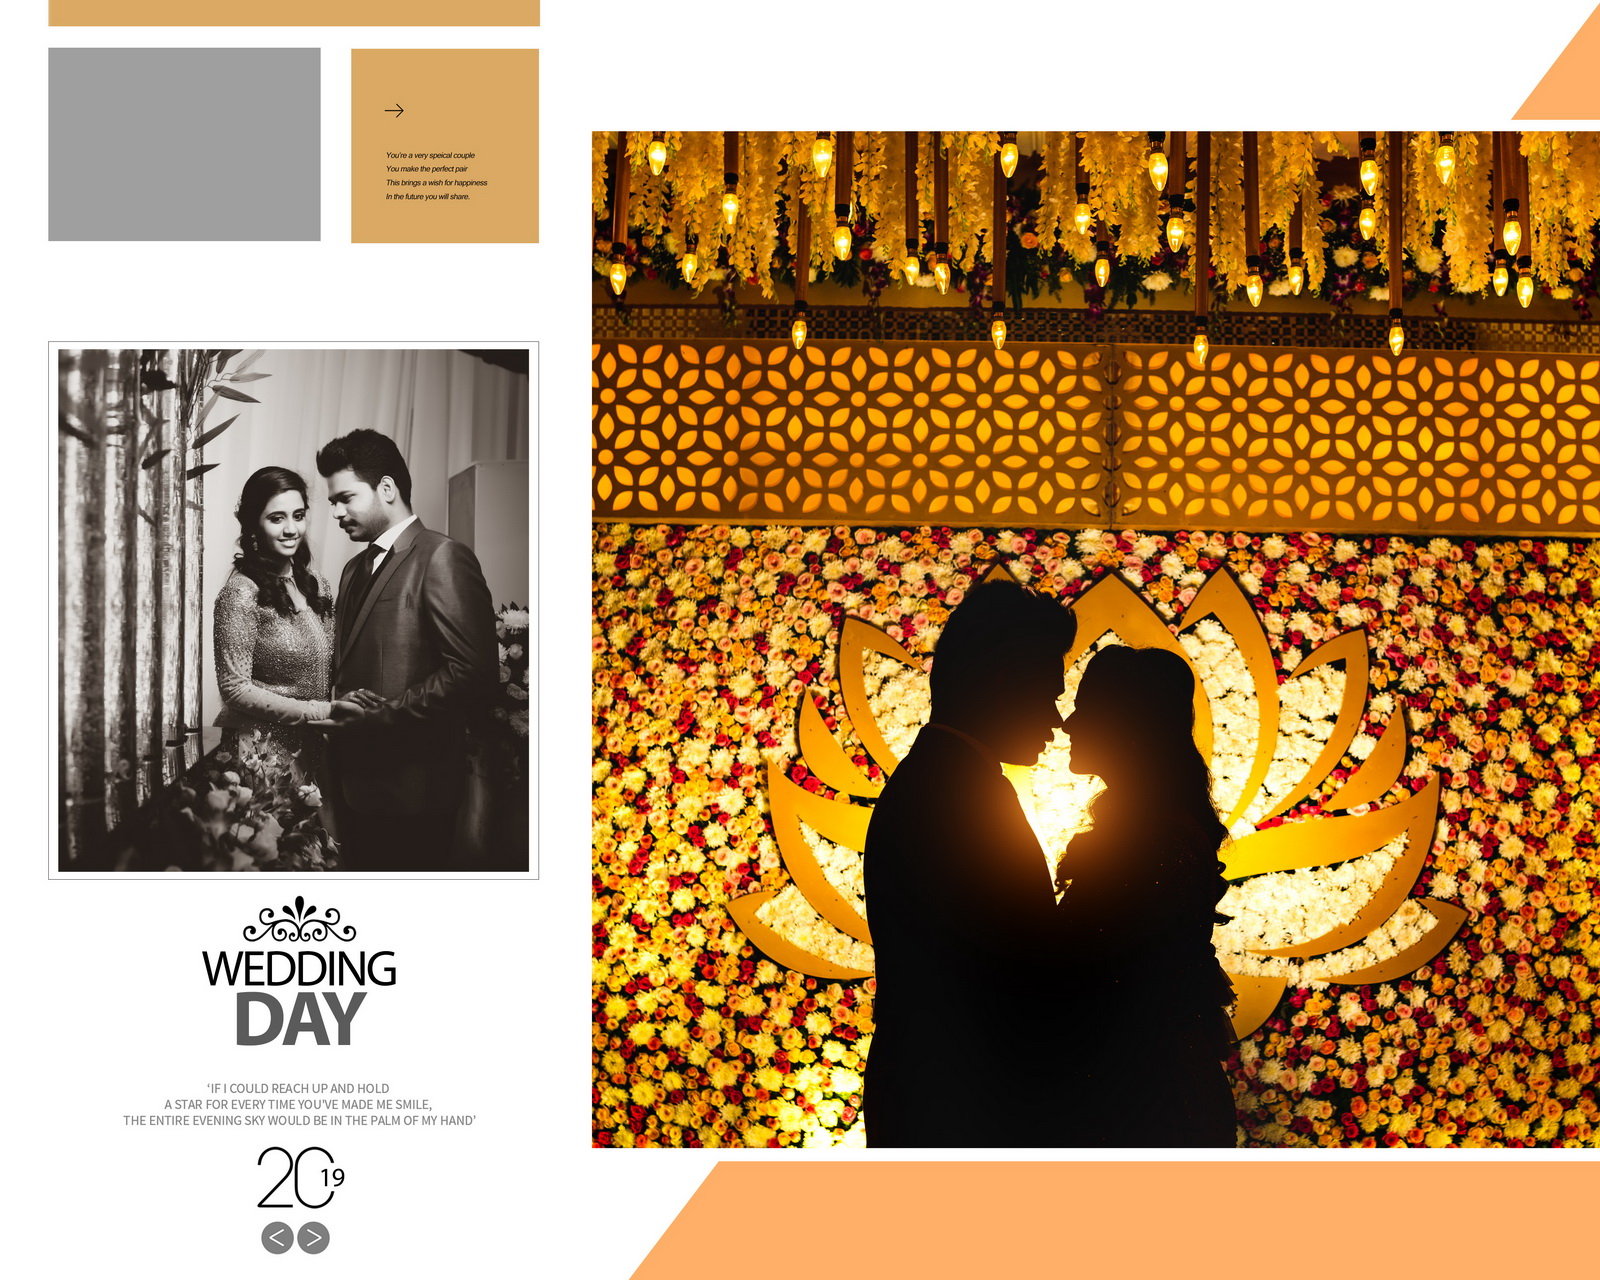 wedding photography in erode (5)